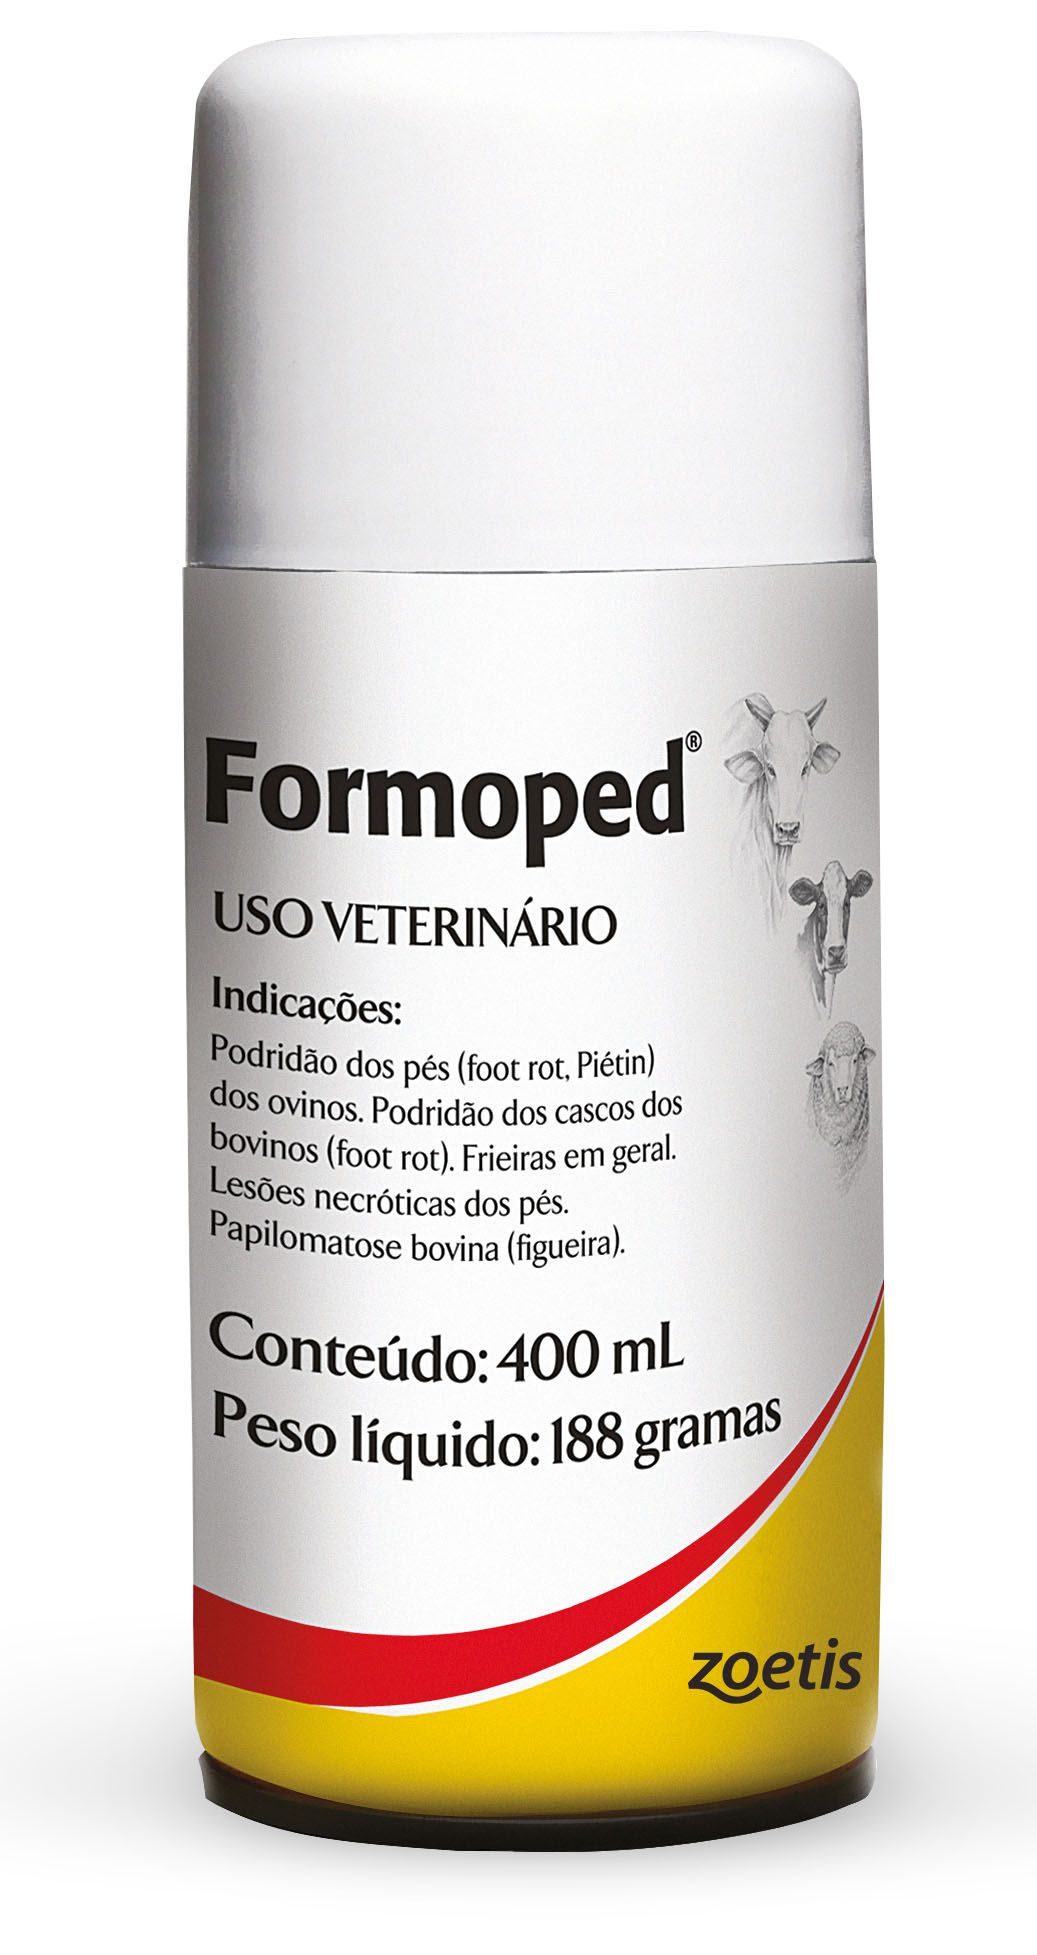 Formoped 400ml - Bactericida e antisséptico